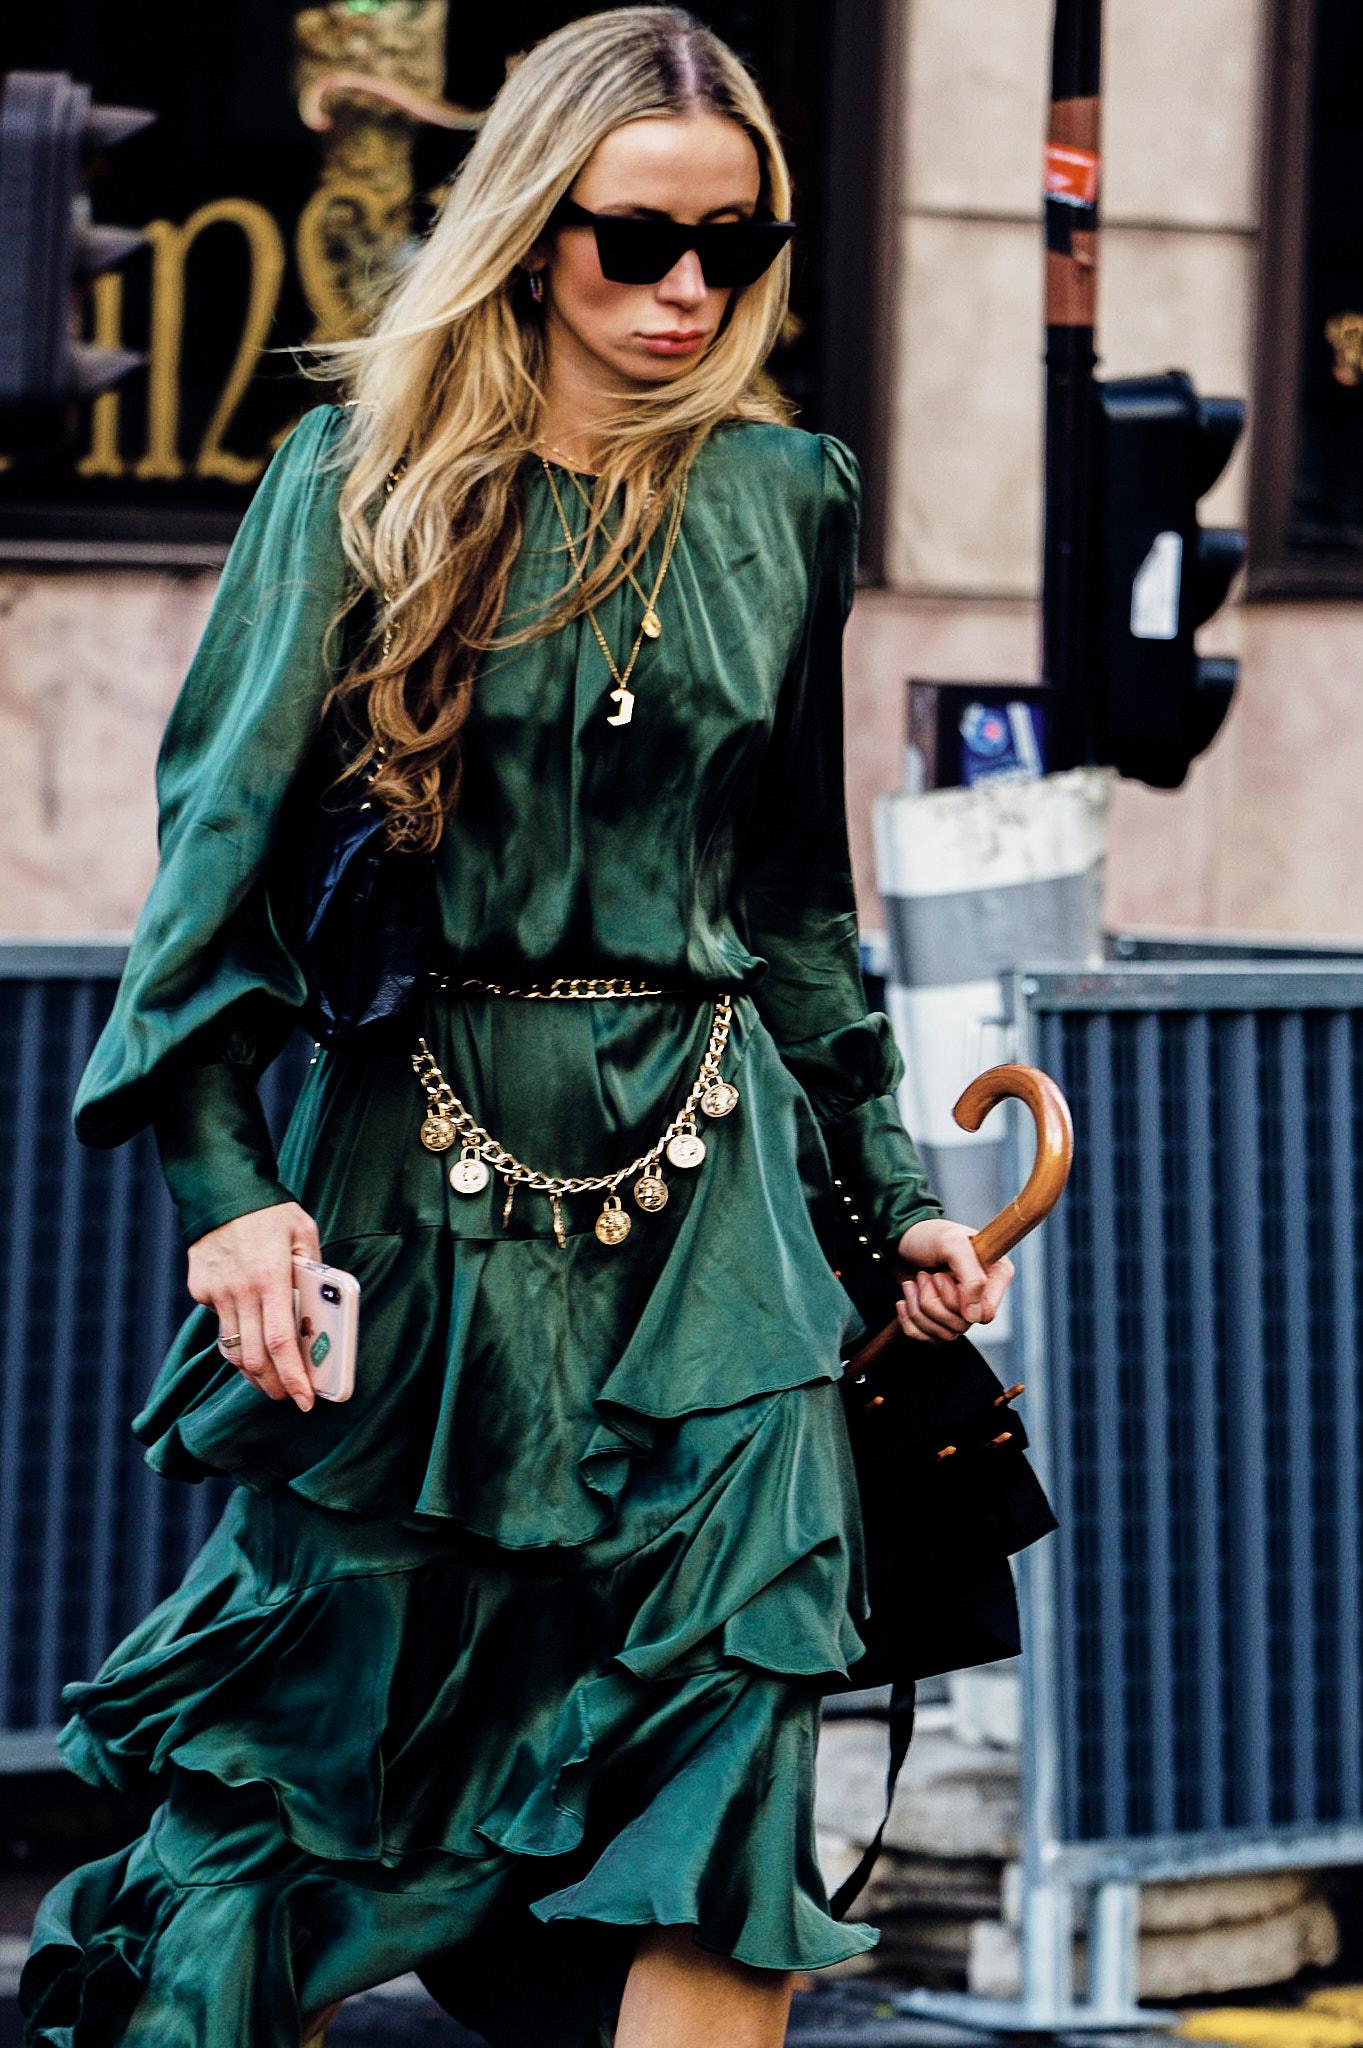 On the street - Outside Thom Browne - Paris Fashion Week SS20